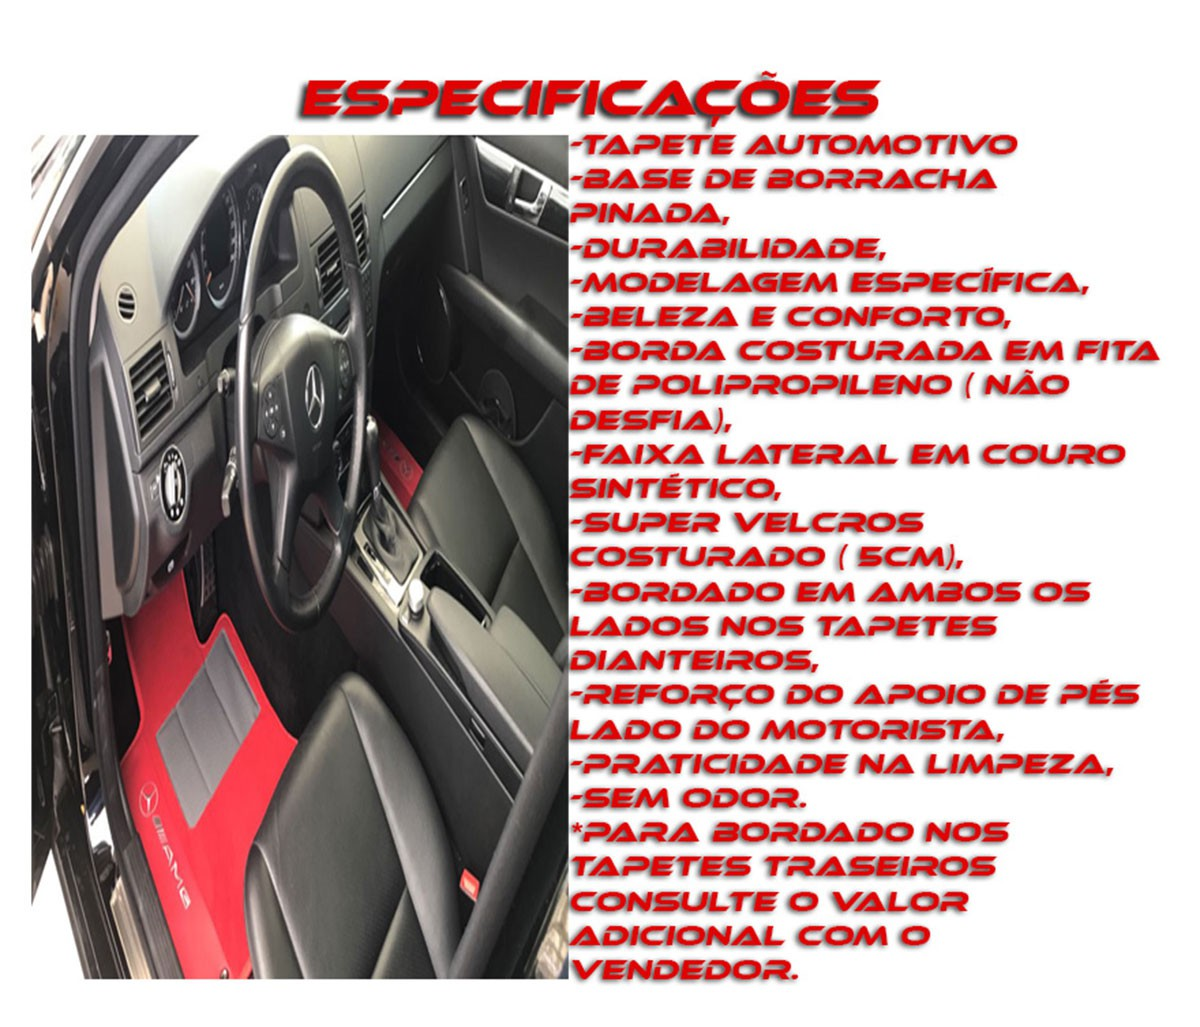 Tapete Audi Tt Carpete Luxo Base Pinada Hitto